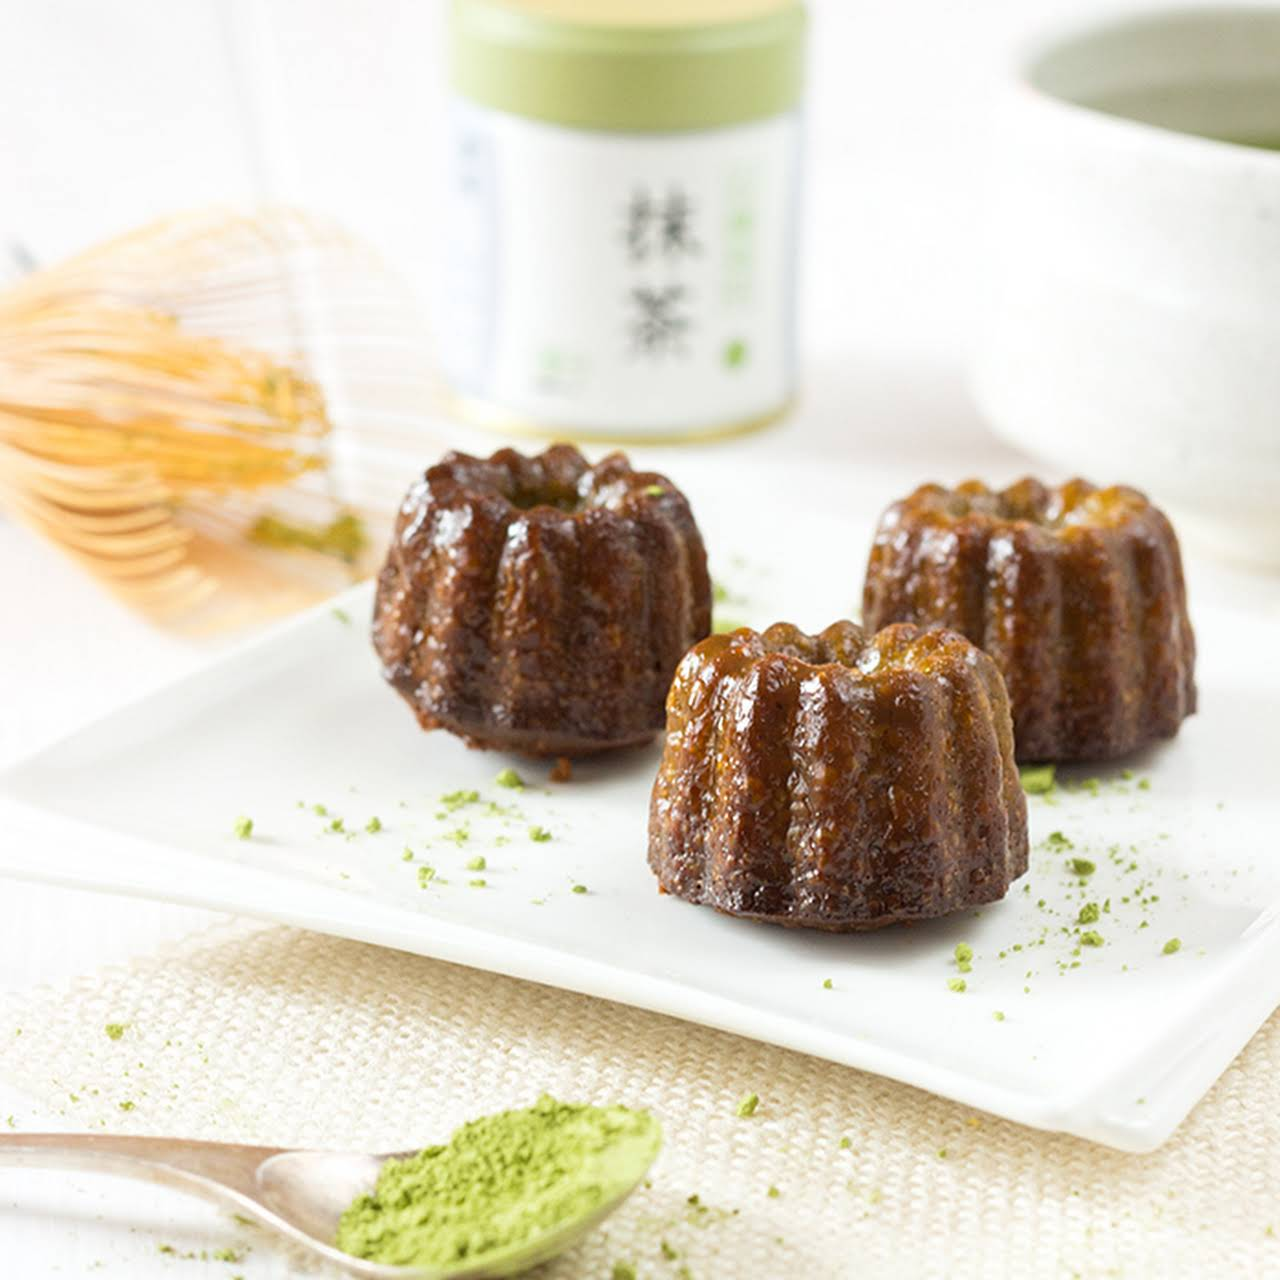 Matcha Green Tea Cannelé